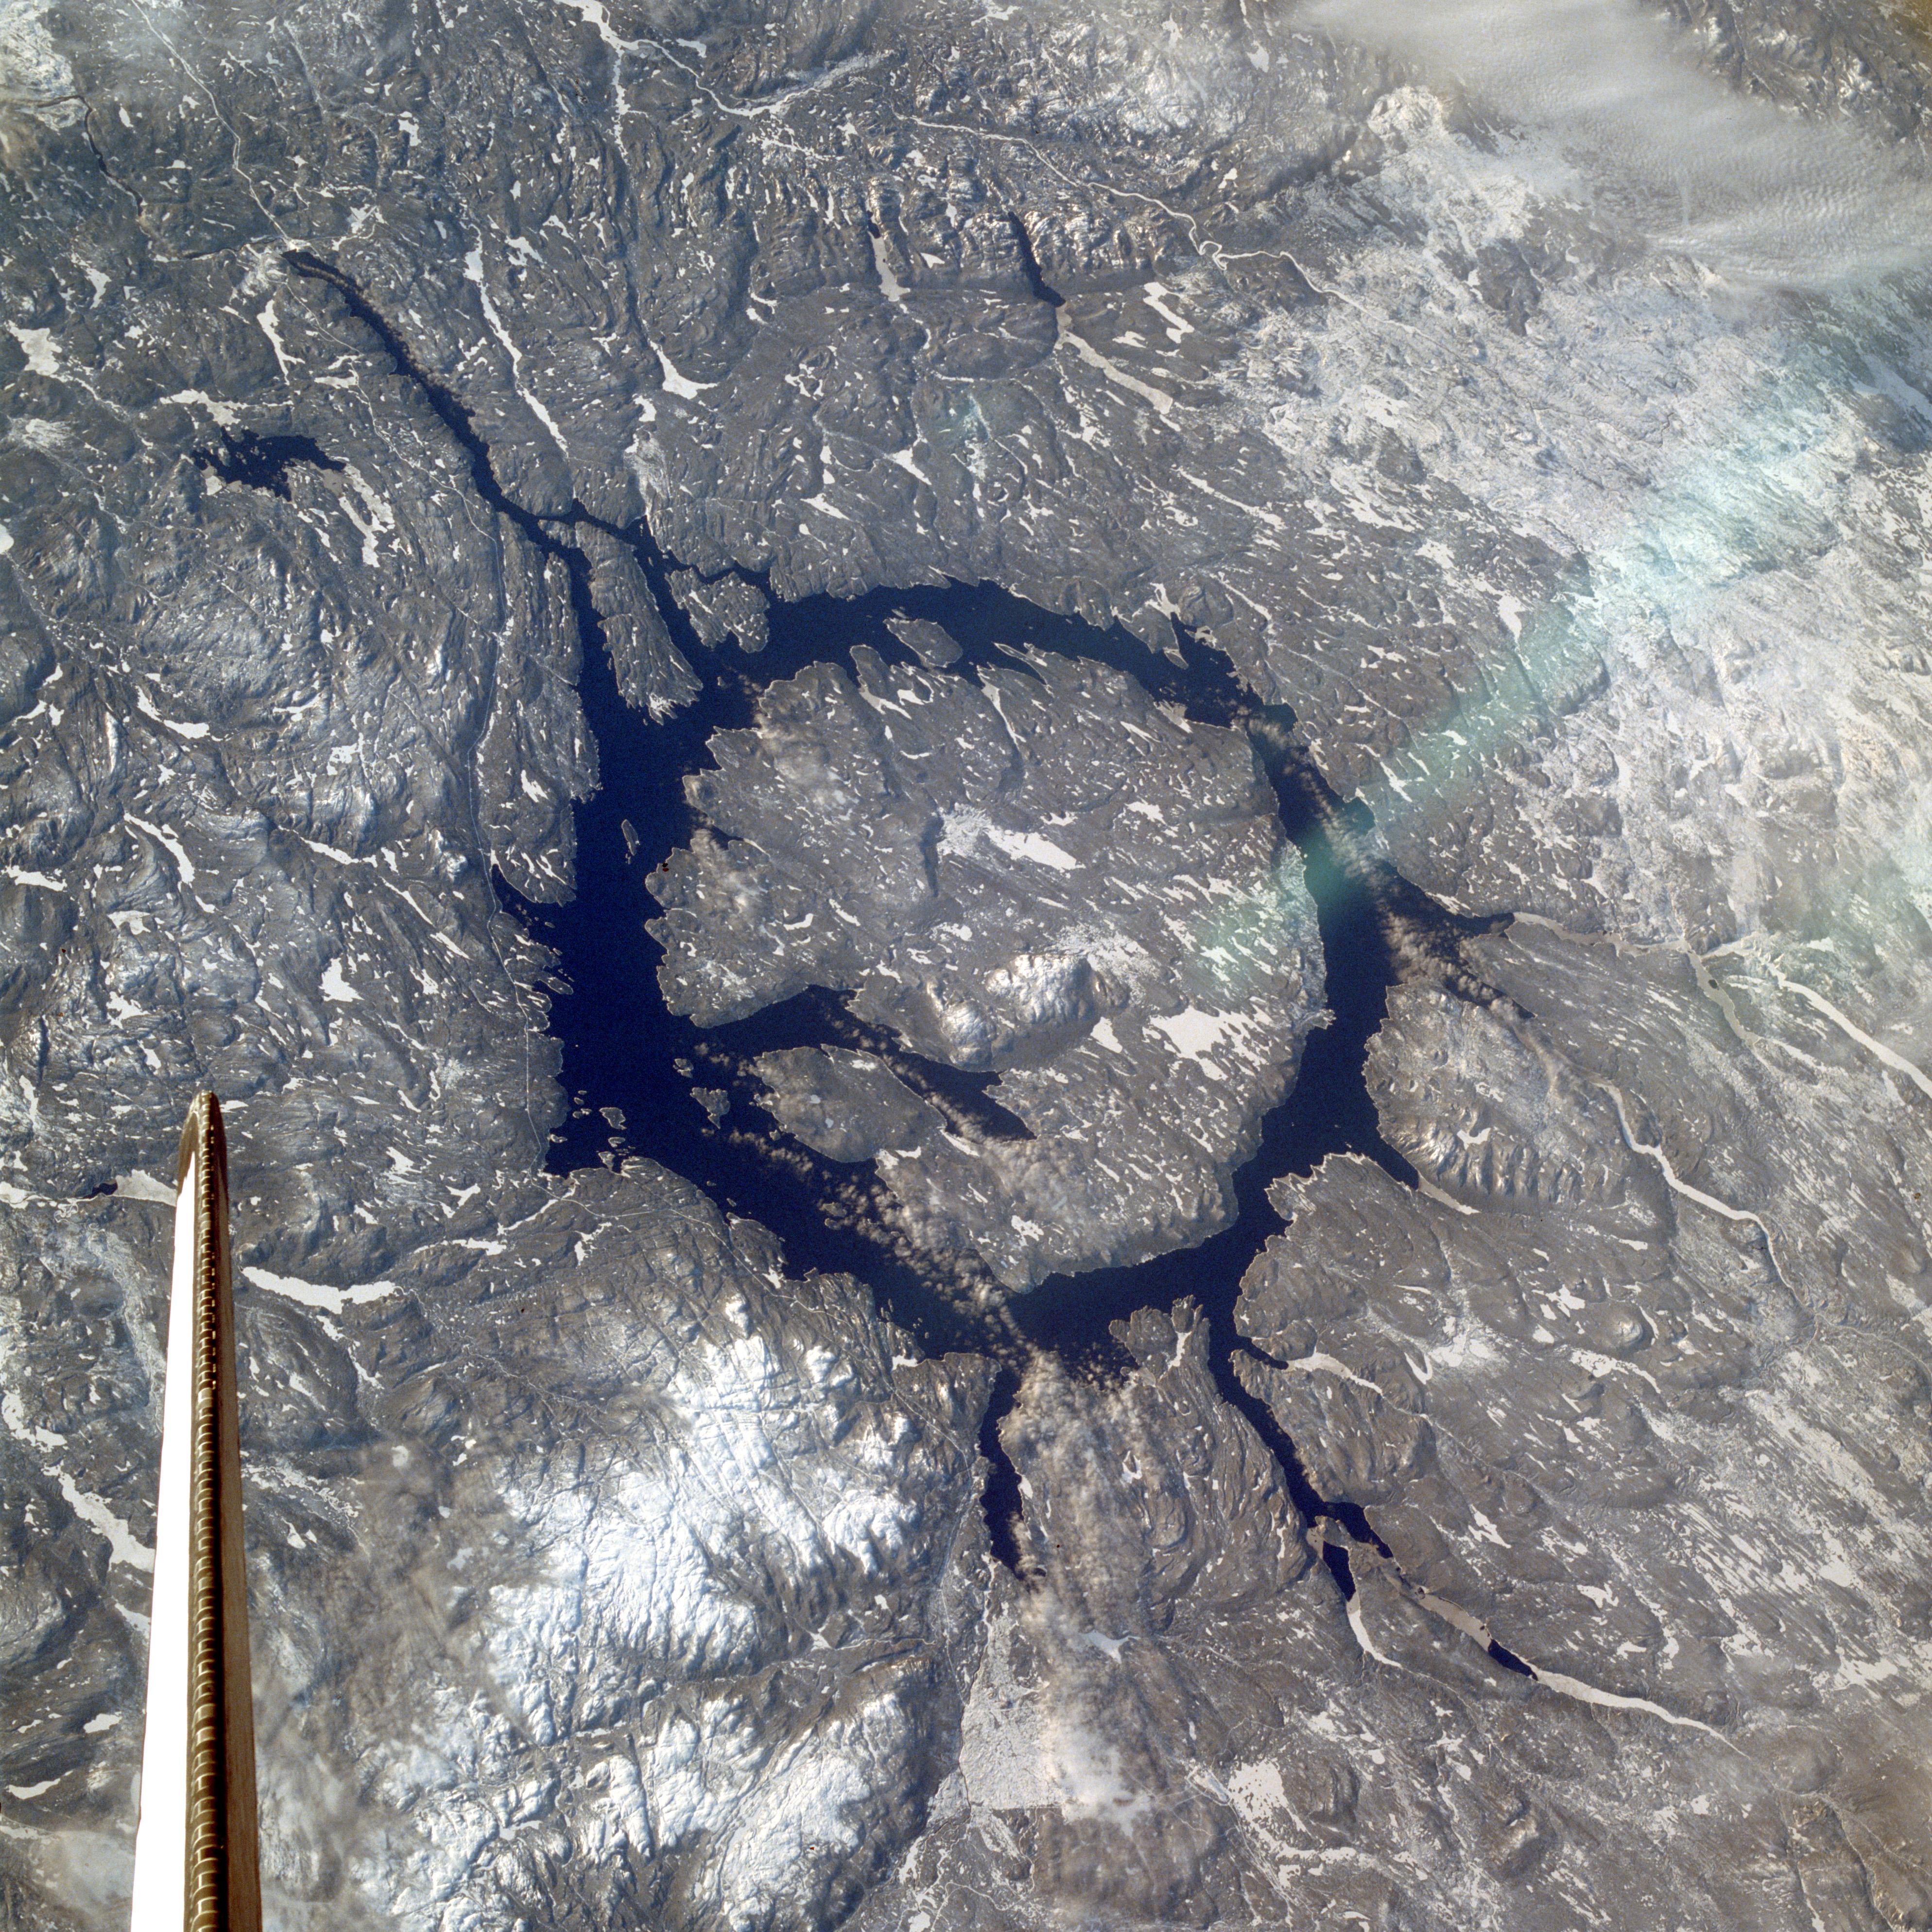 [Image: STS009_Manicouagan.jpg]